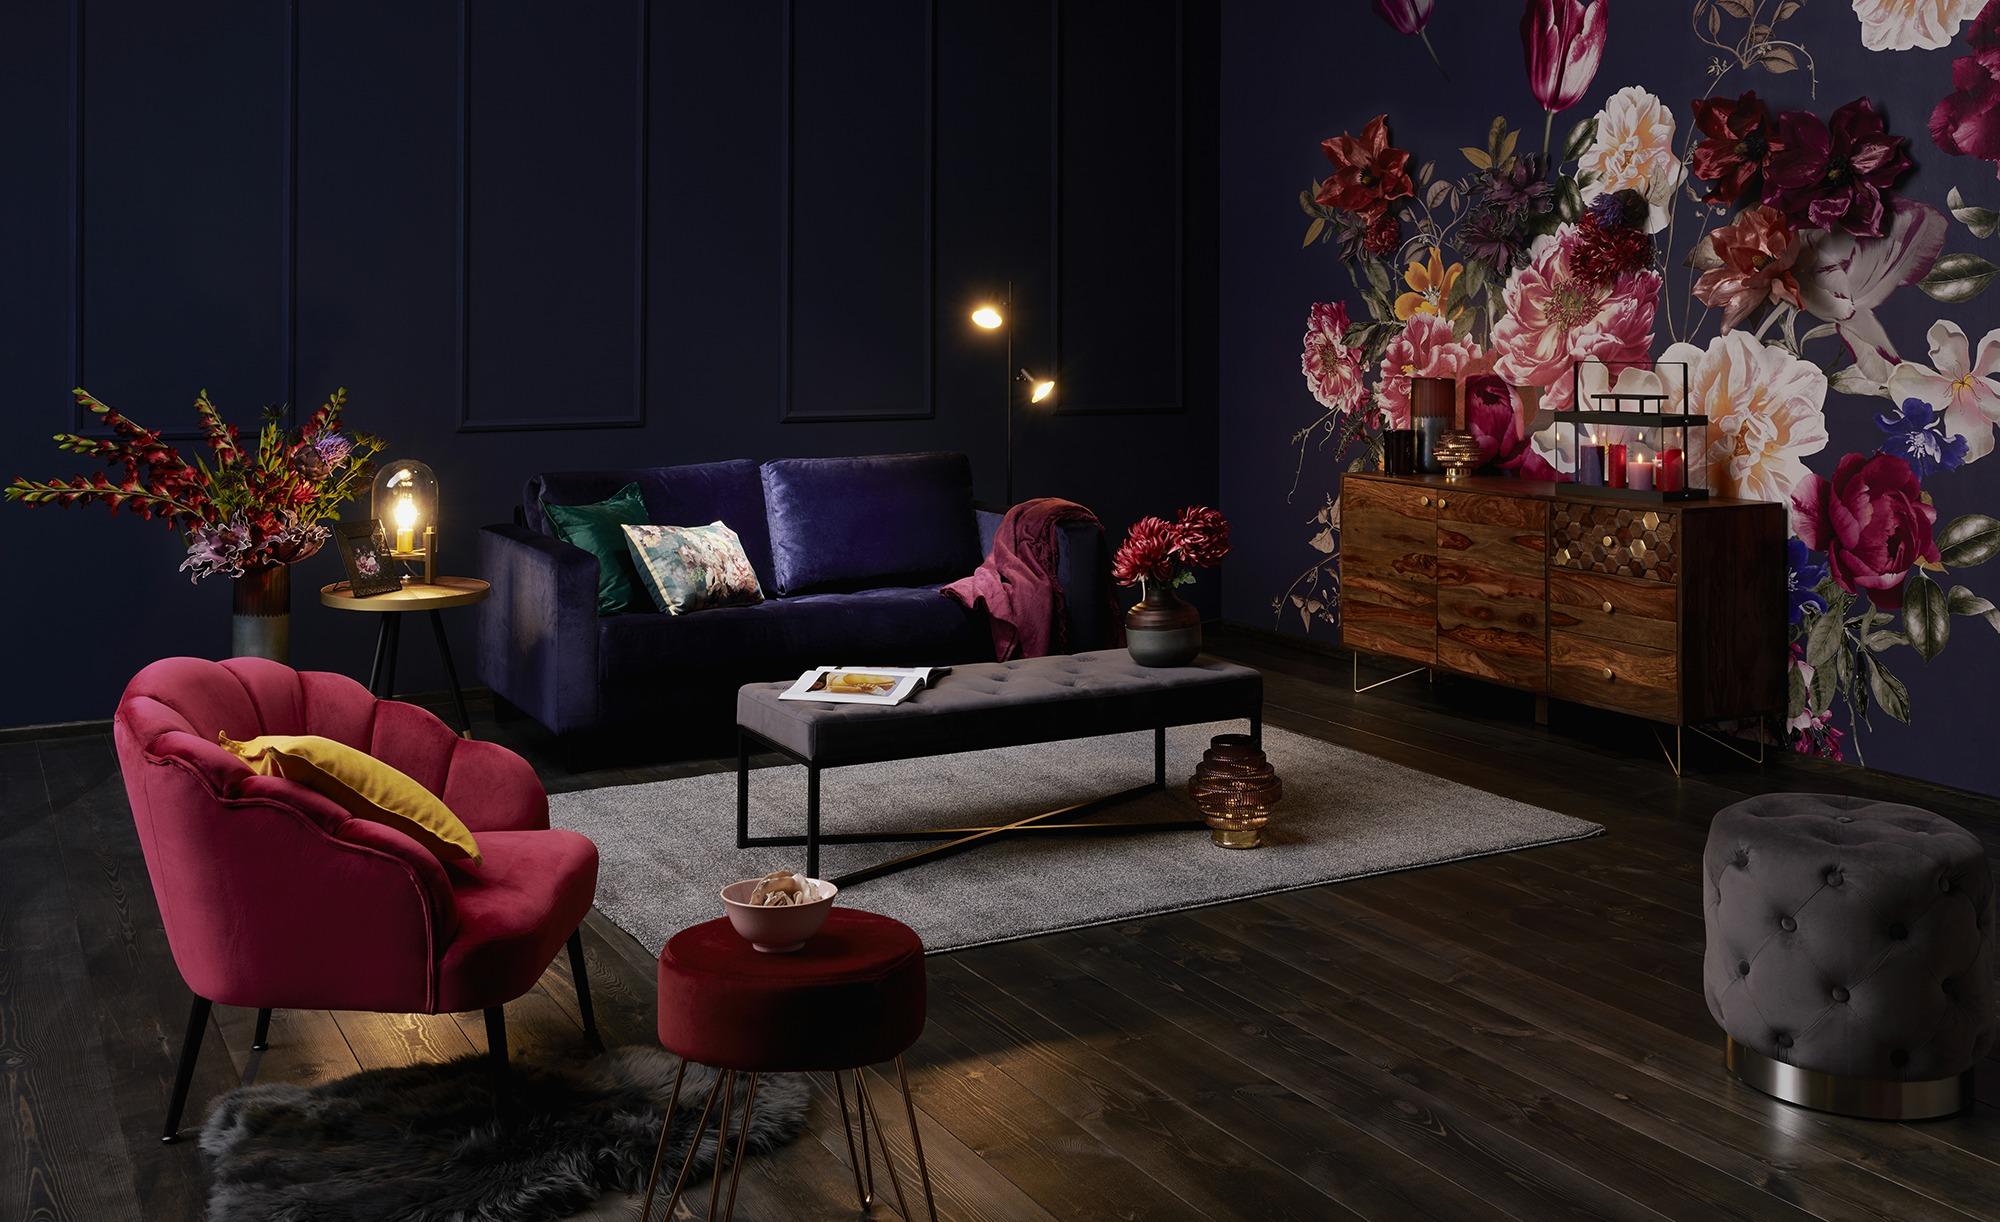 smart Sofa blau - Mikrofaser Geradine ¦ blau ¦ Maße (cm): B: 178 H: 83 T: 91 Polstermöbel > Sofas > 2-Sitzer - Höffner